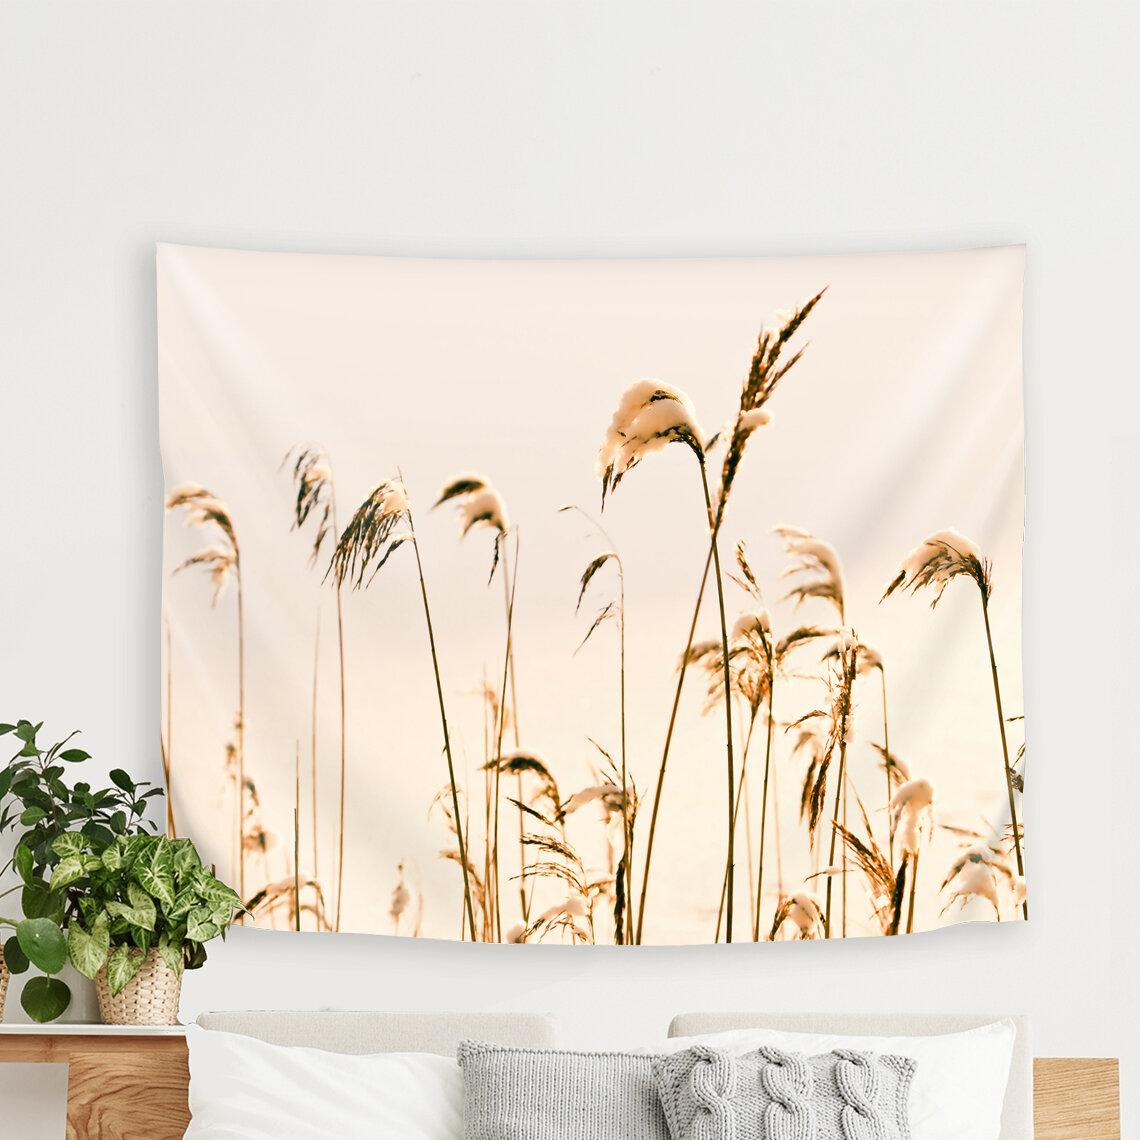 East Urban Home Mirja Paljakka Reeds At Winter Tapestry Wayfair